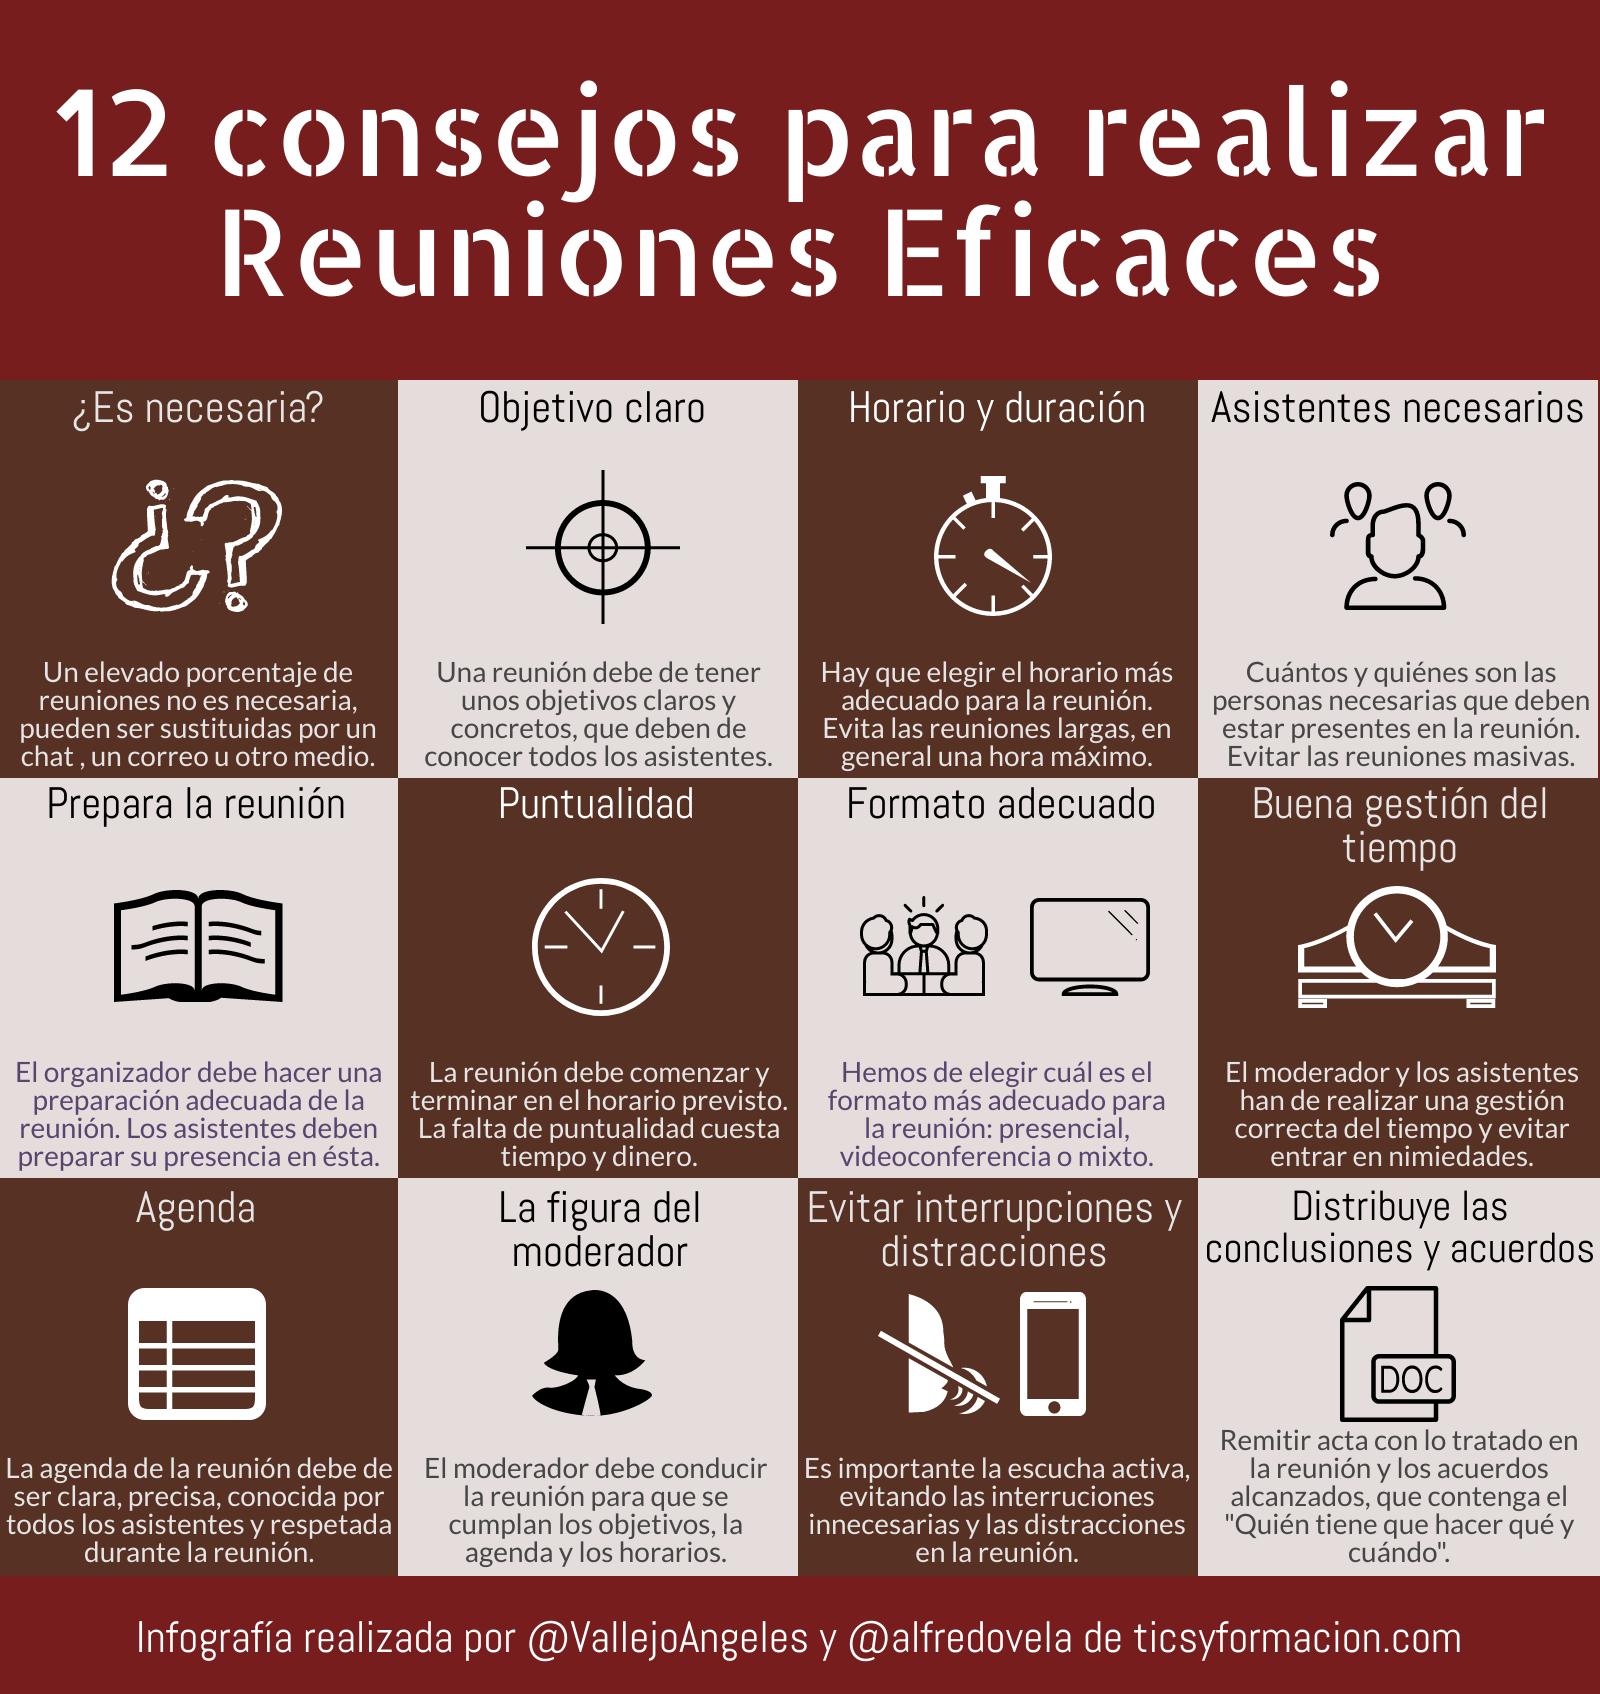 12 consejos para realizar Reuniones Eficaces #infografia #infographic #gestióndeltiempo #rrhh